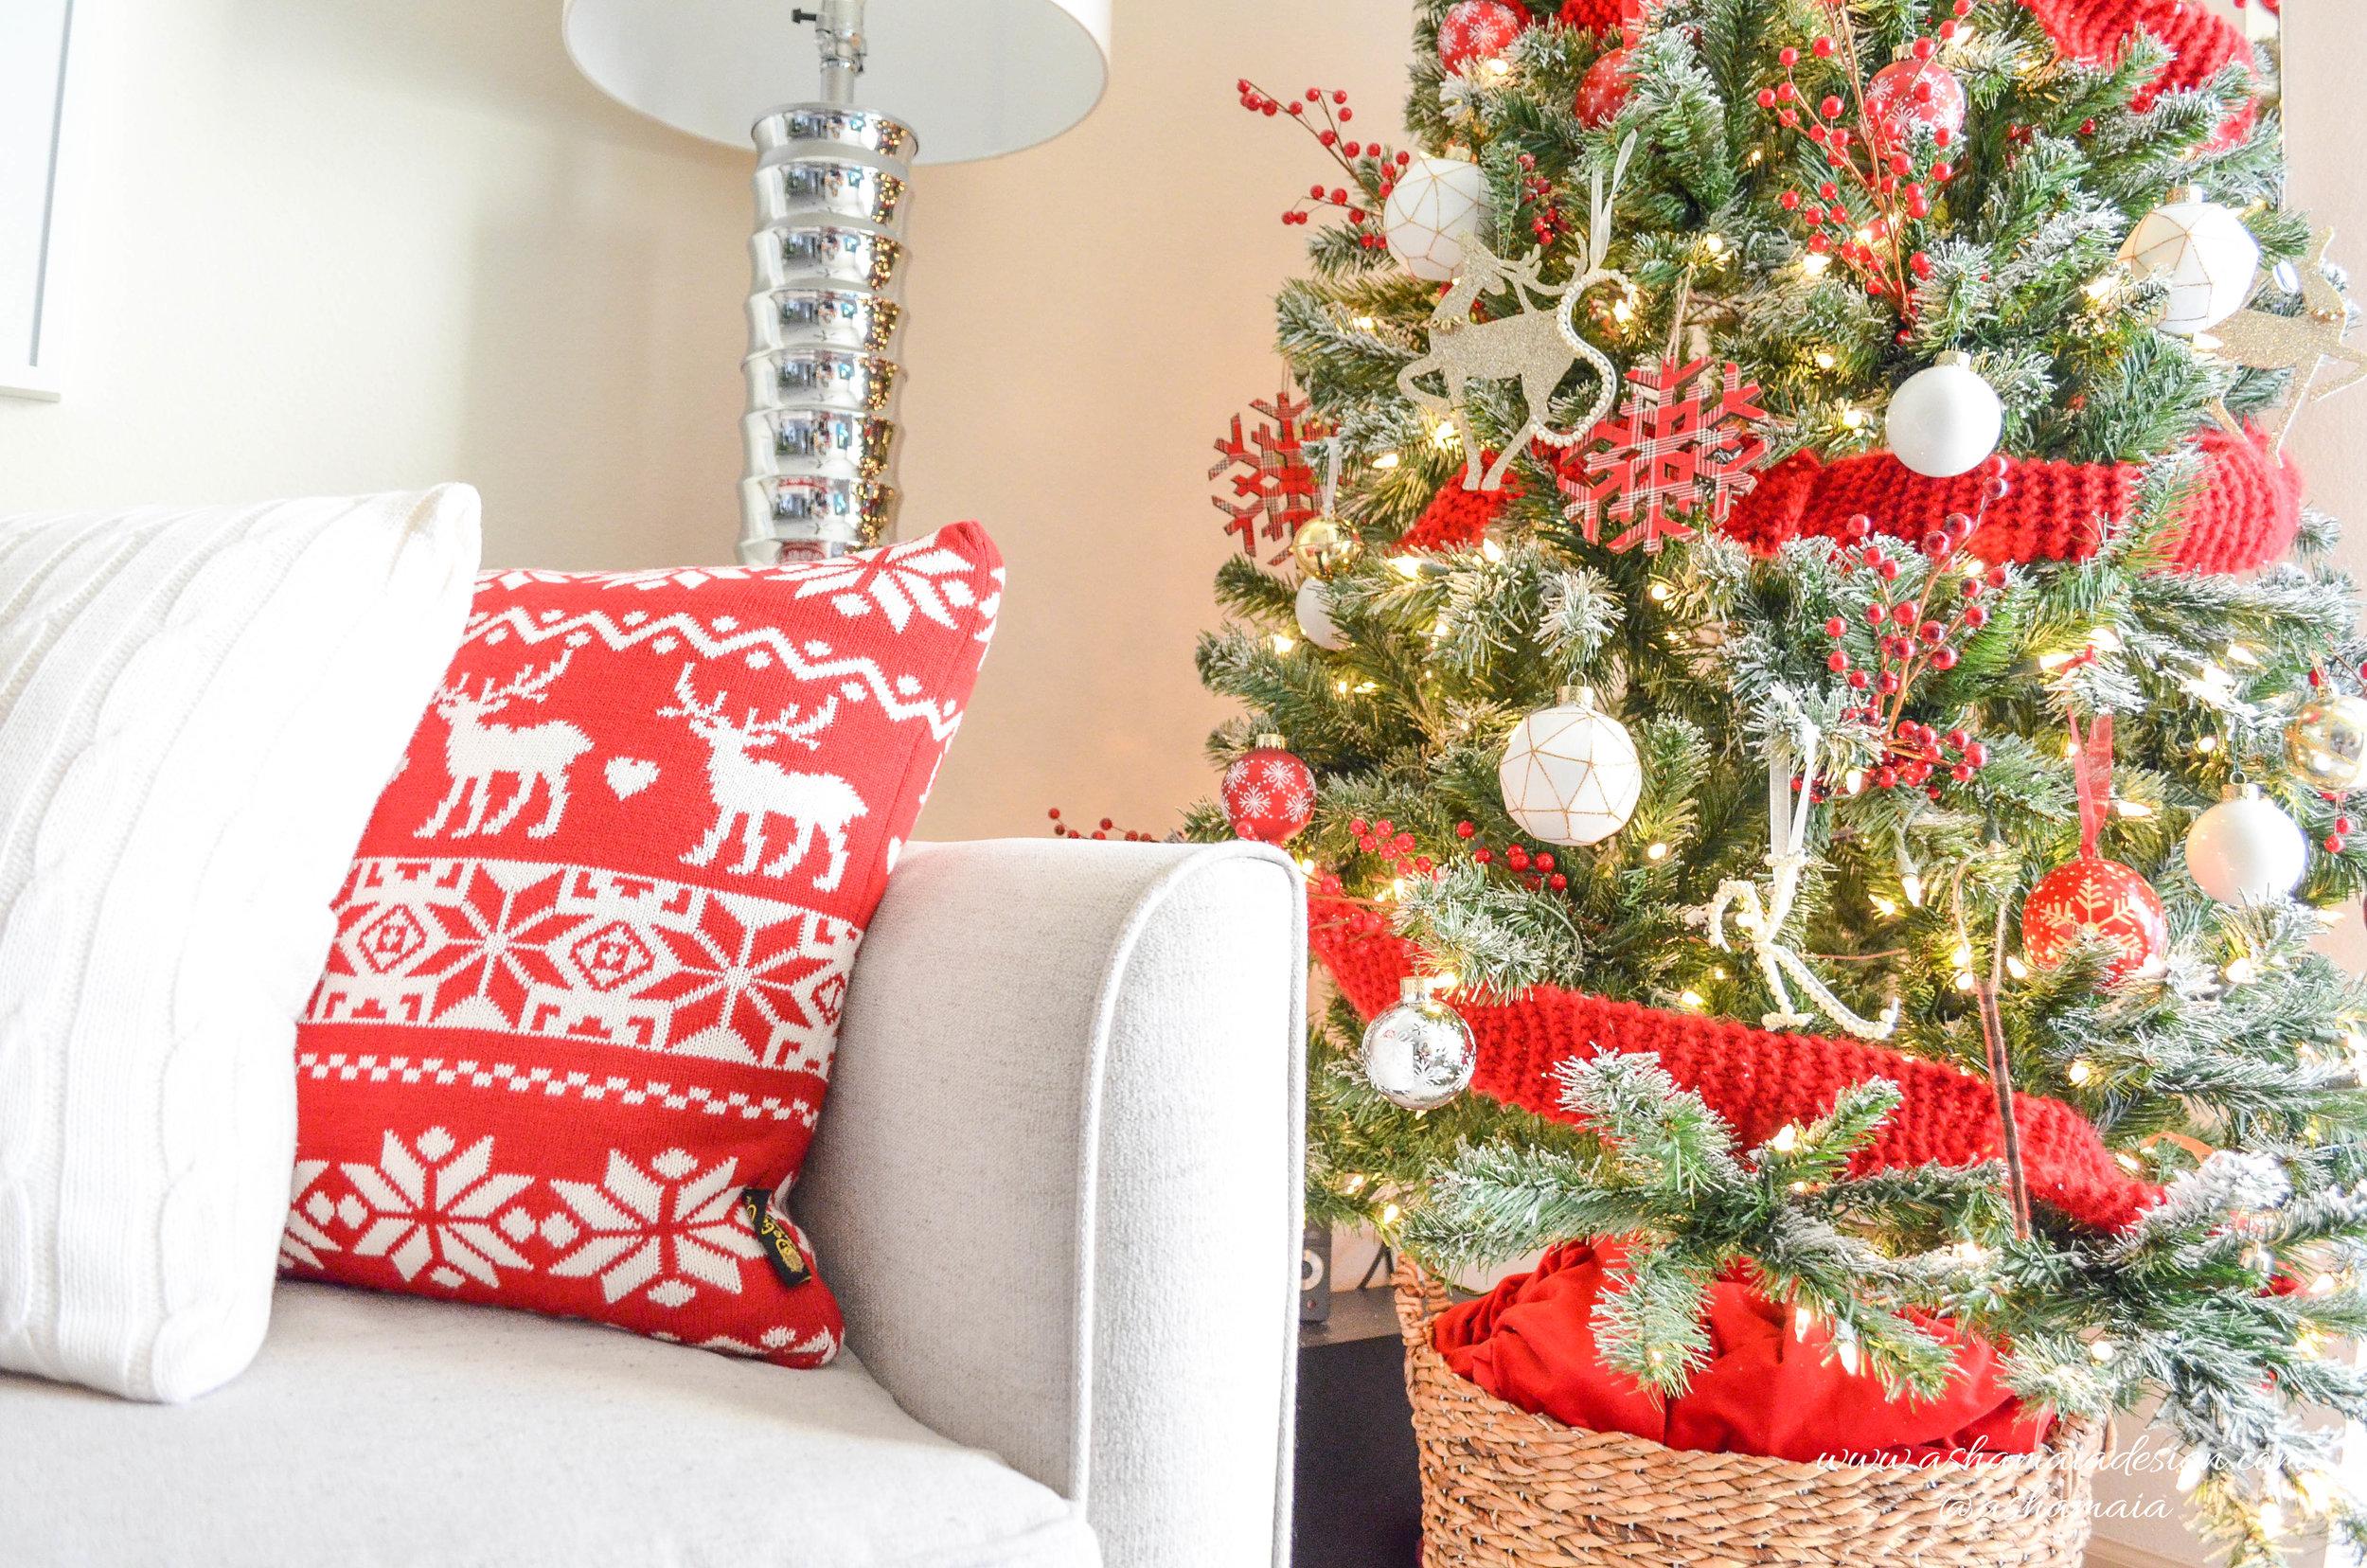 Warm & Cozy Christmas Living Room Decor with Christmas Sweater Throw Pillows and Christmas Tree